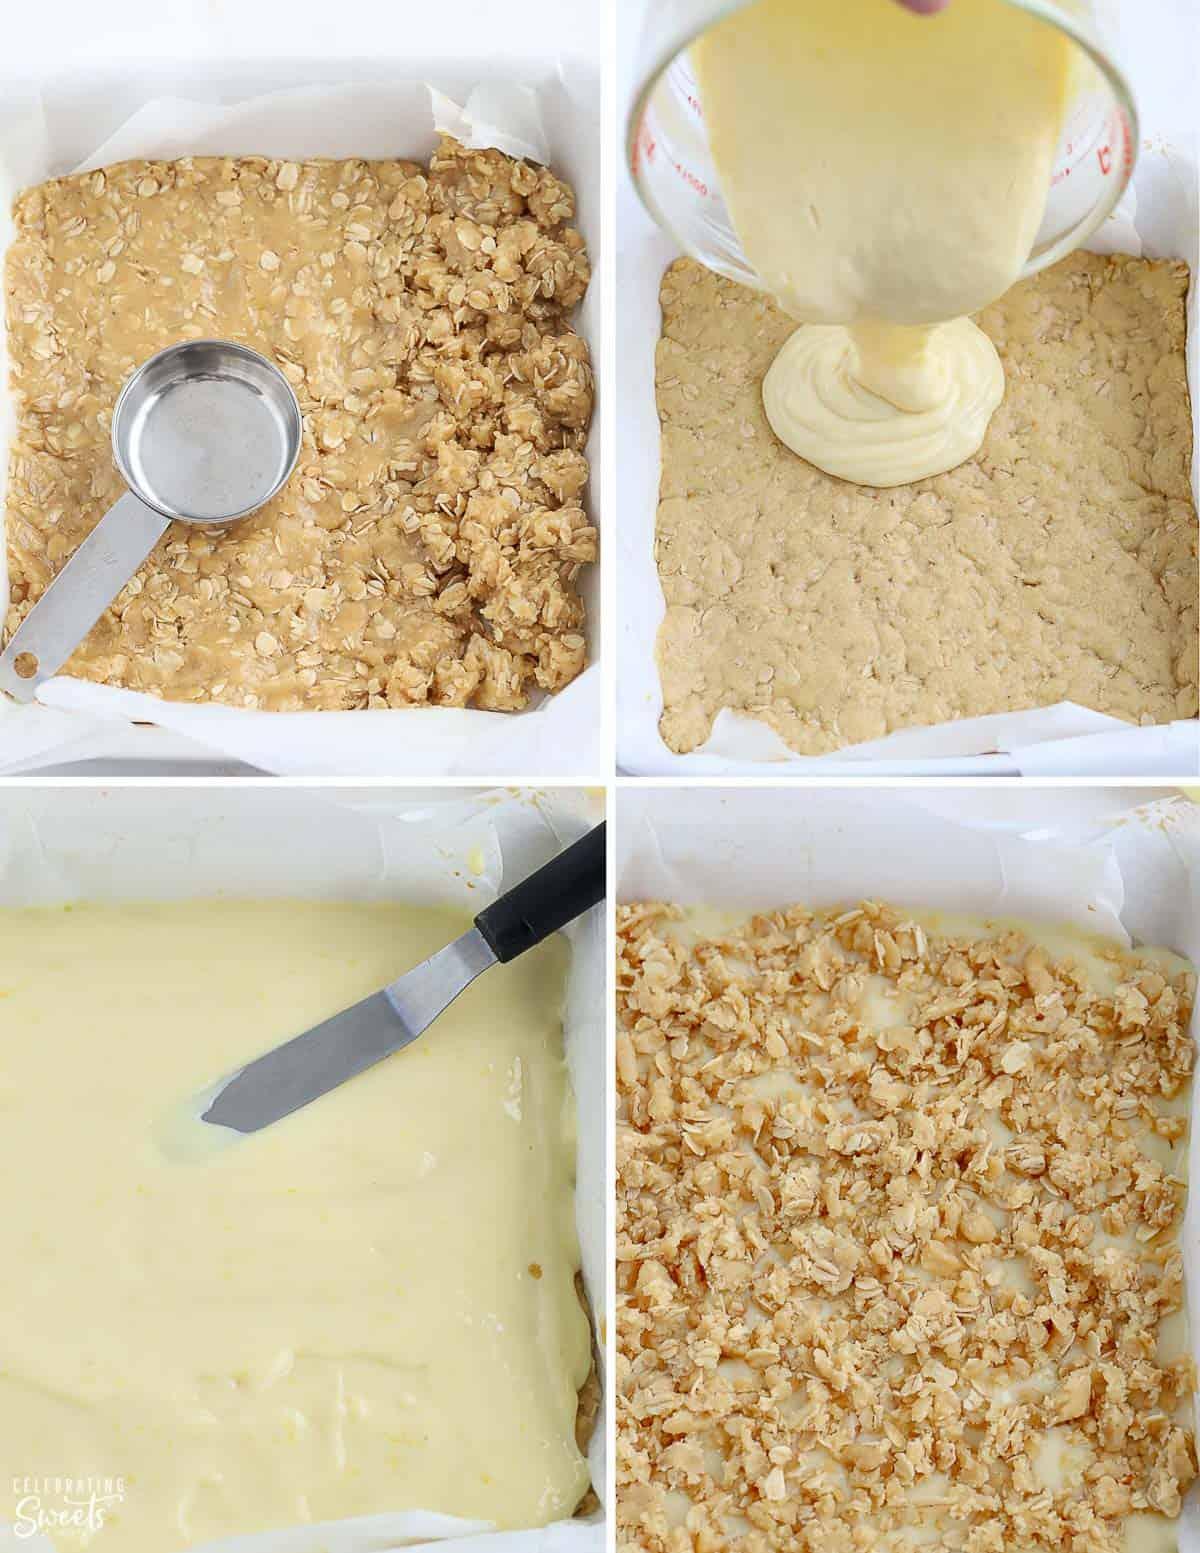 Step by step how to make lemon crumb bars